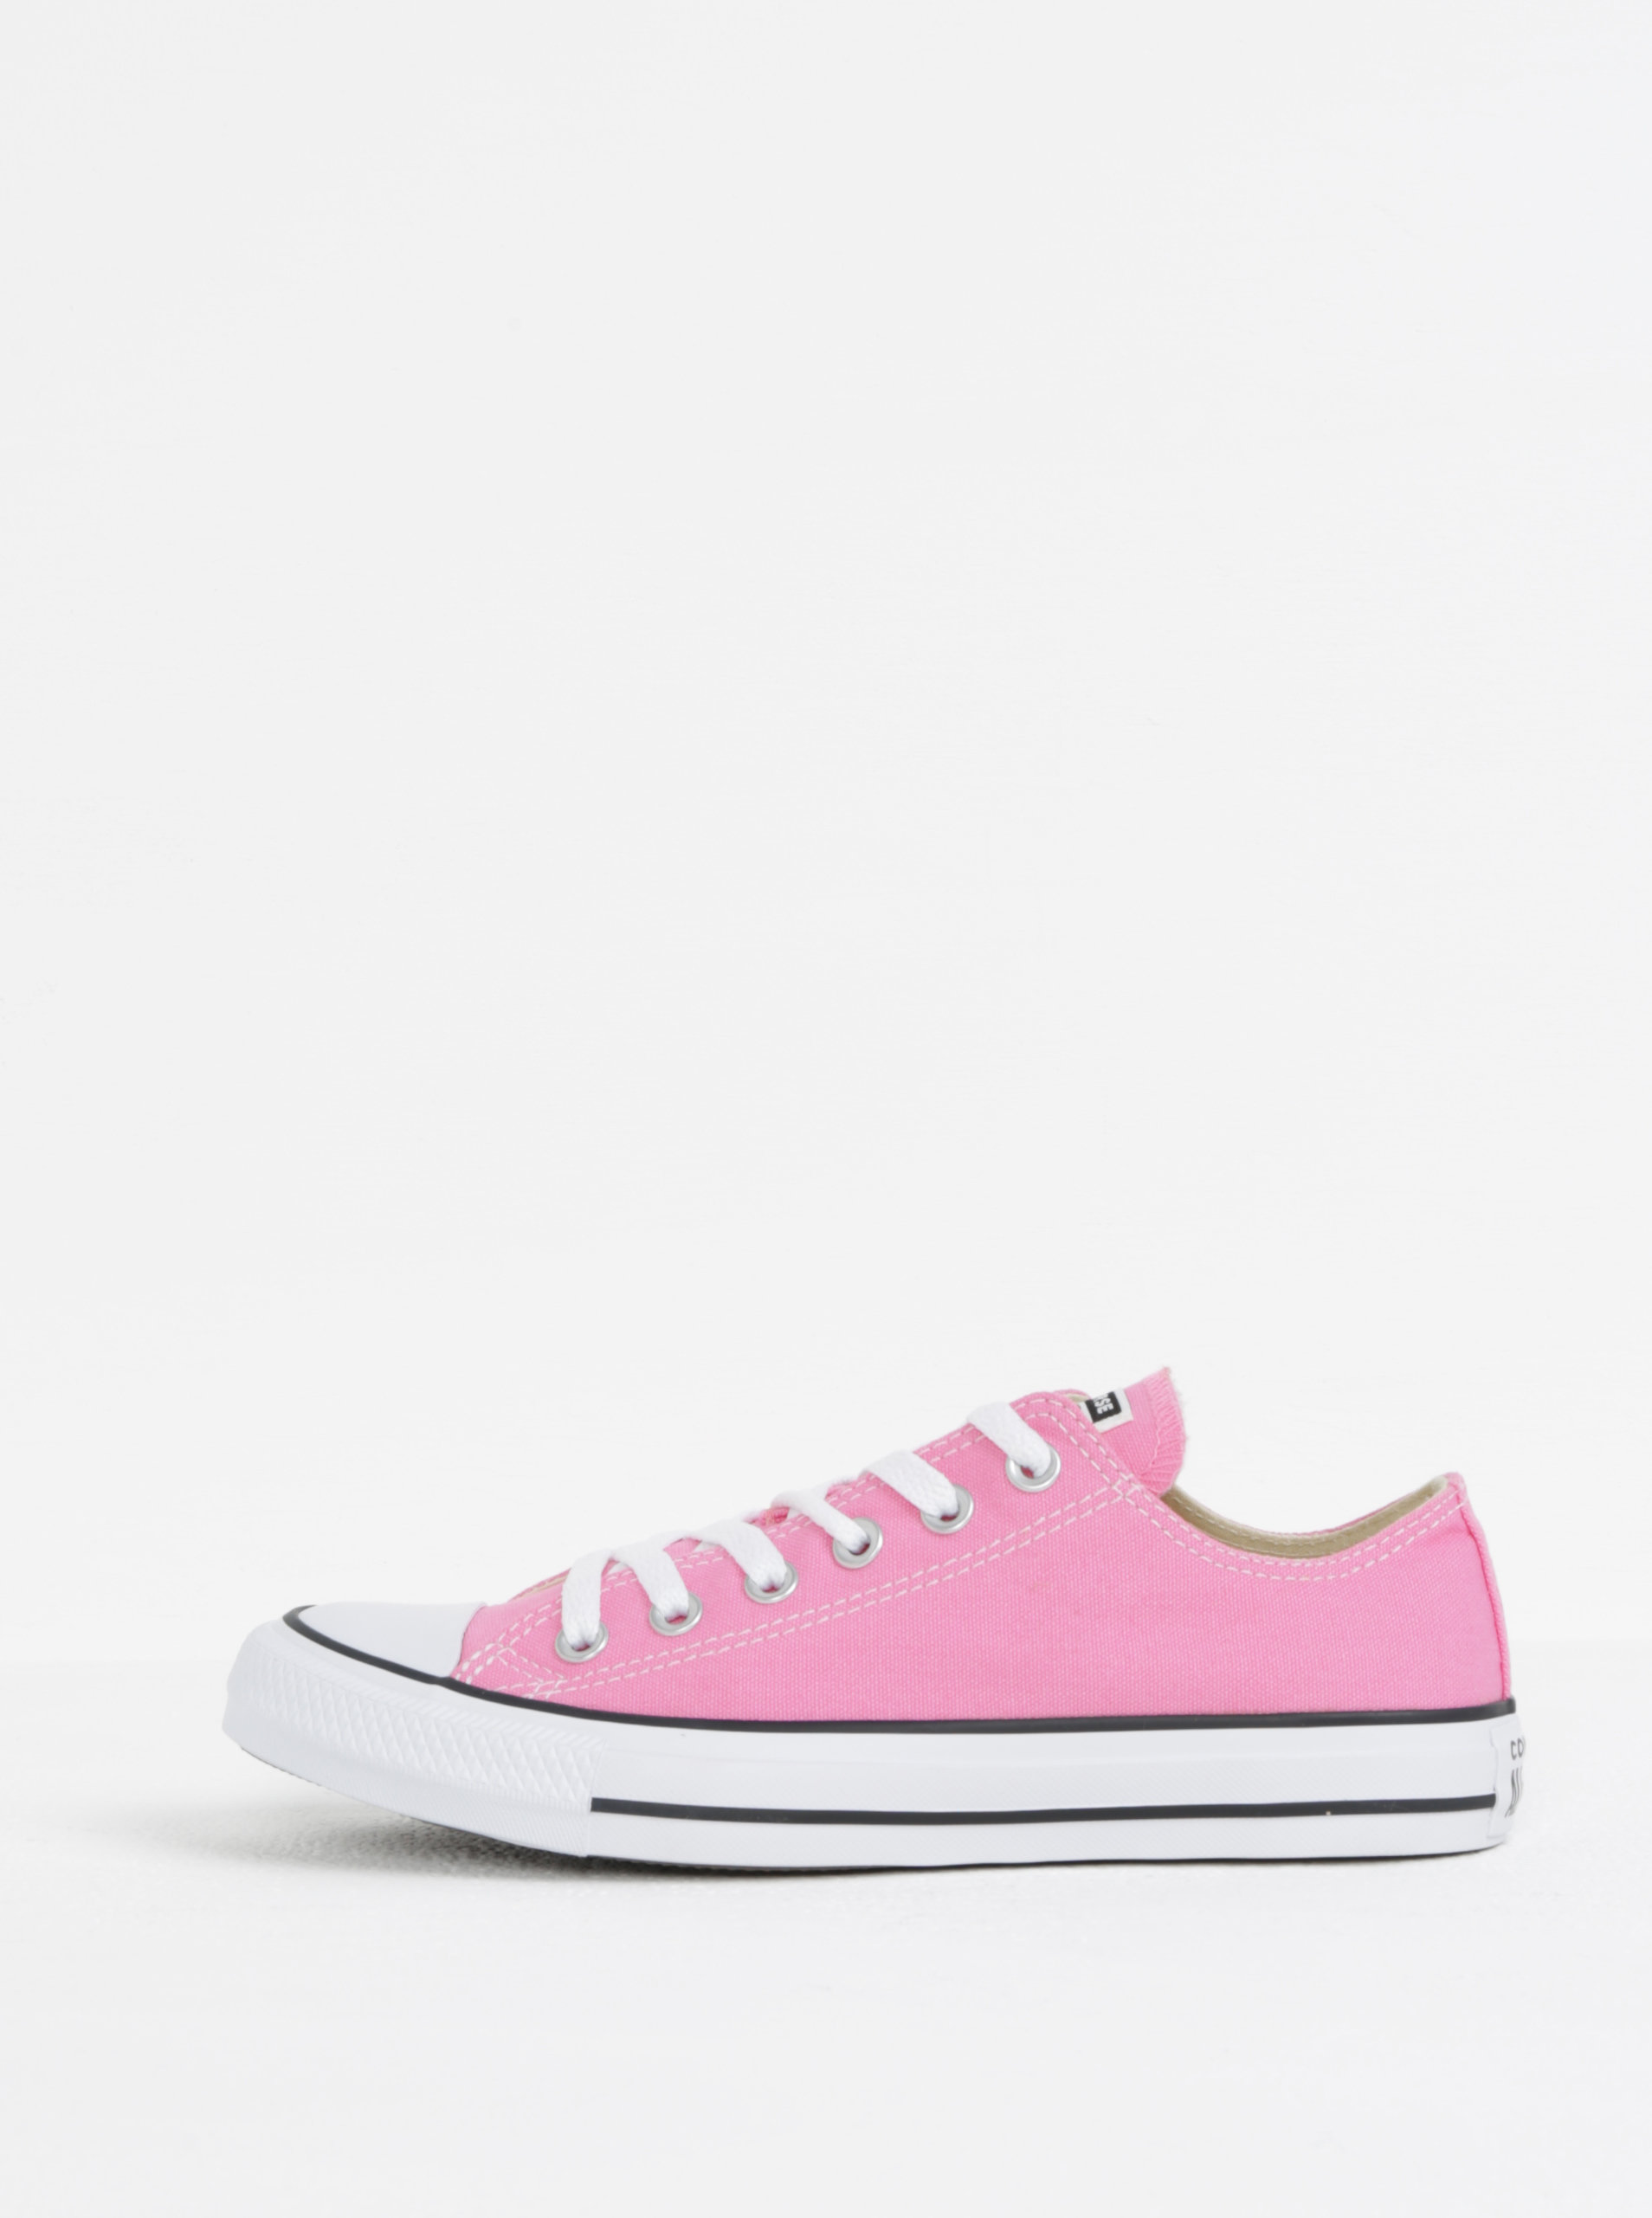 Ružové dámske tenisky Converse Chuck Taylor All Star ... ed7505ee45d